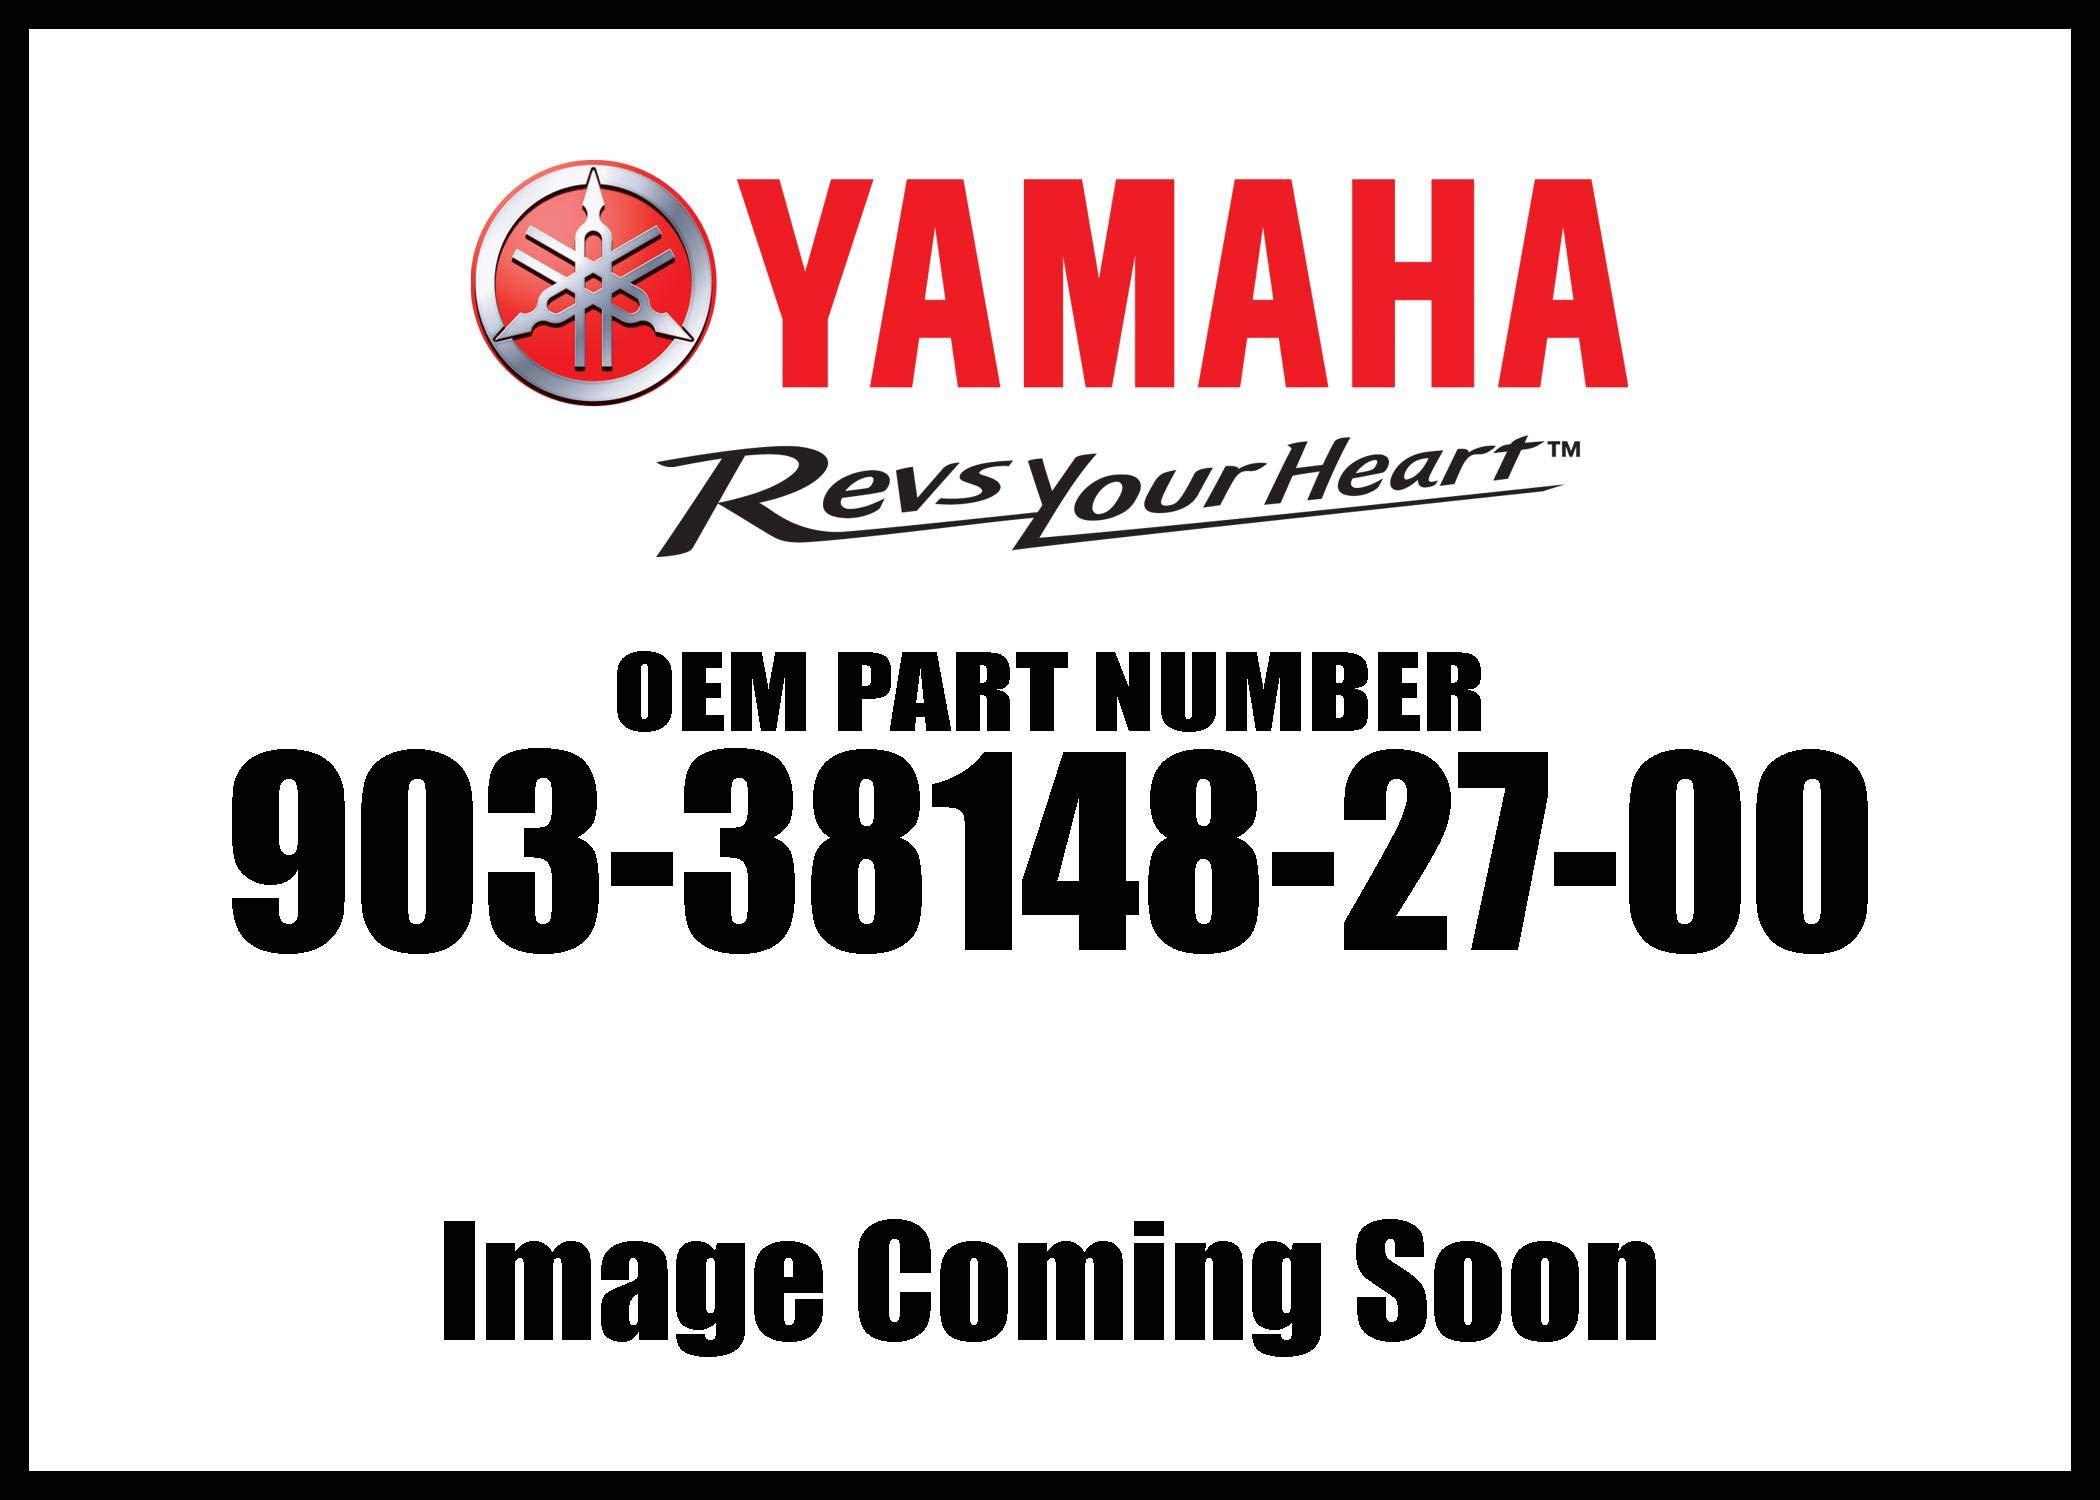 Yamaha 90338-14827-00 PLUG,SPEC'L SHAPE; 903381482700